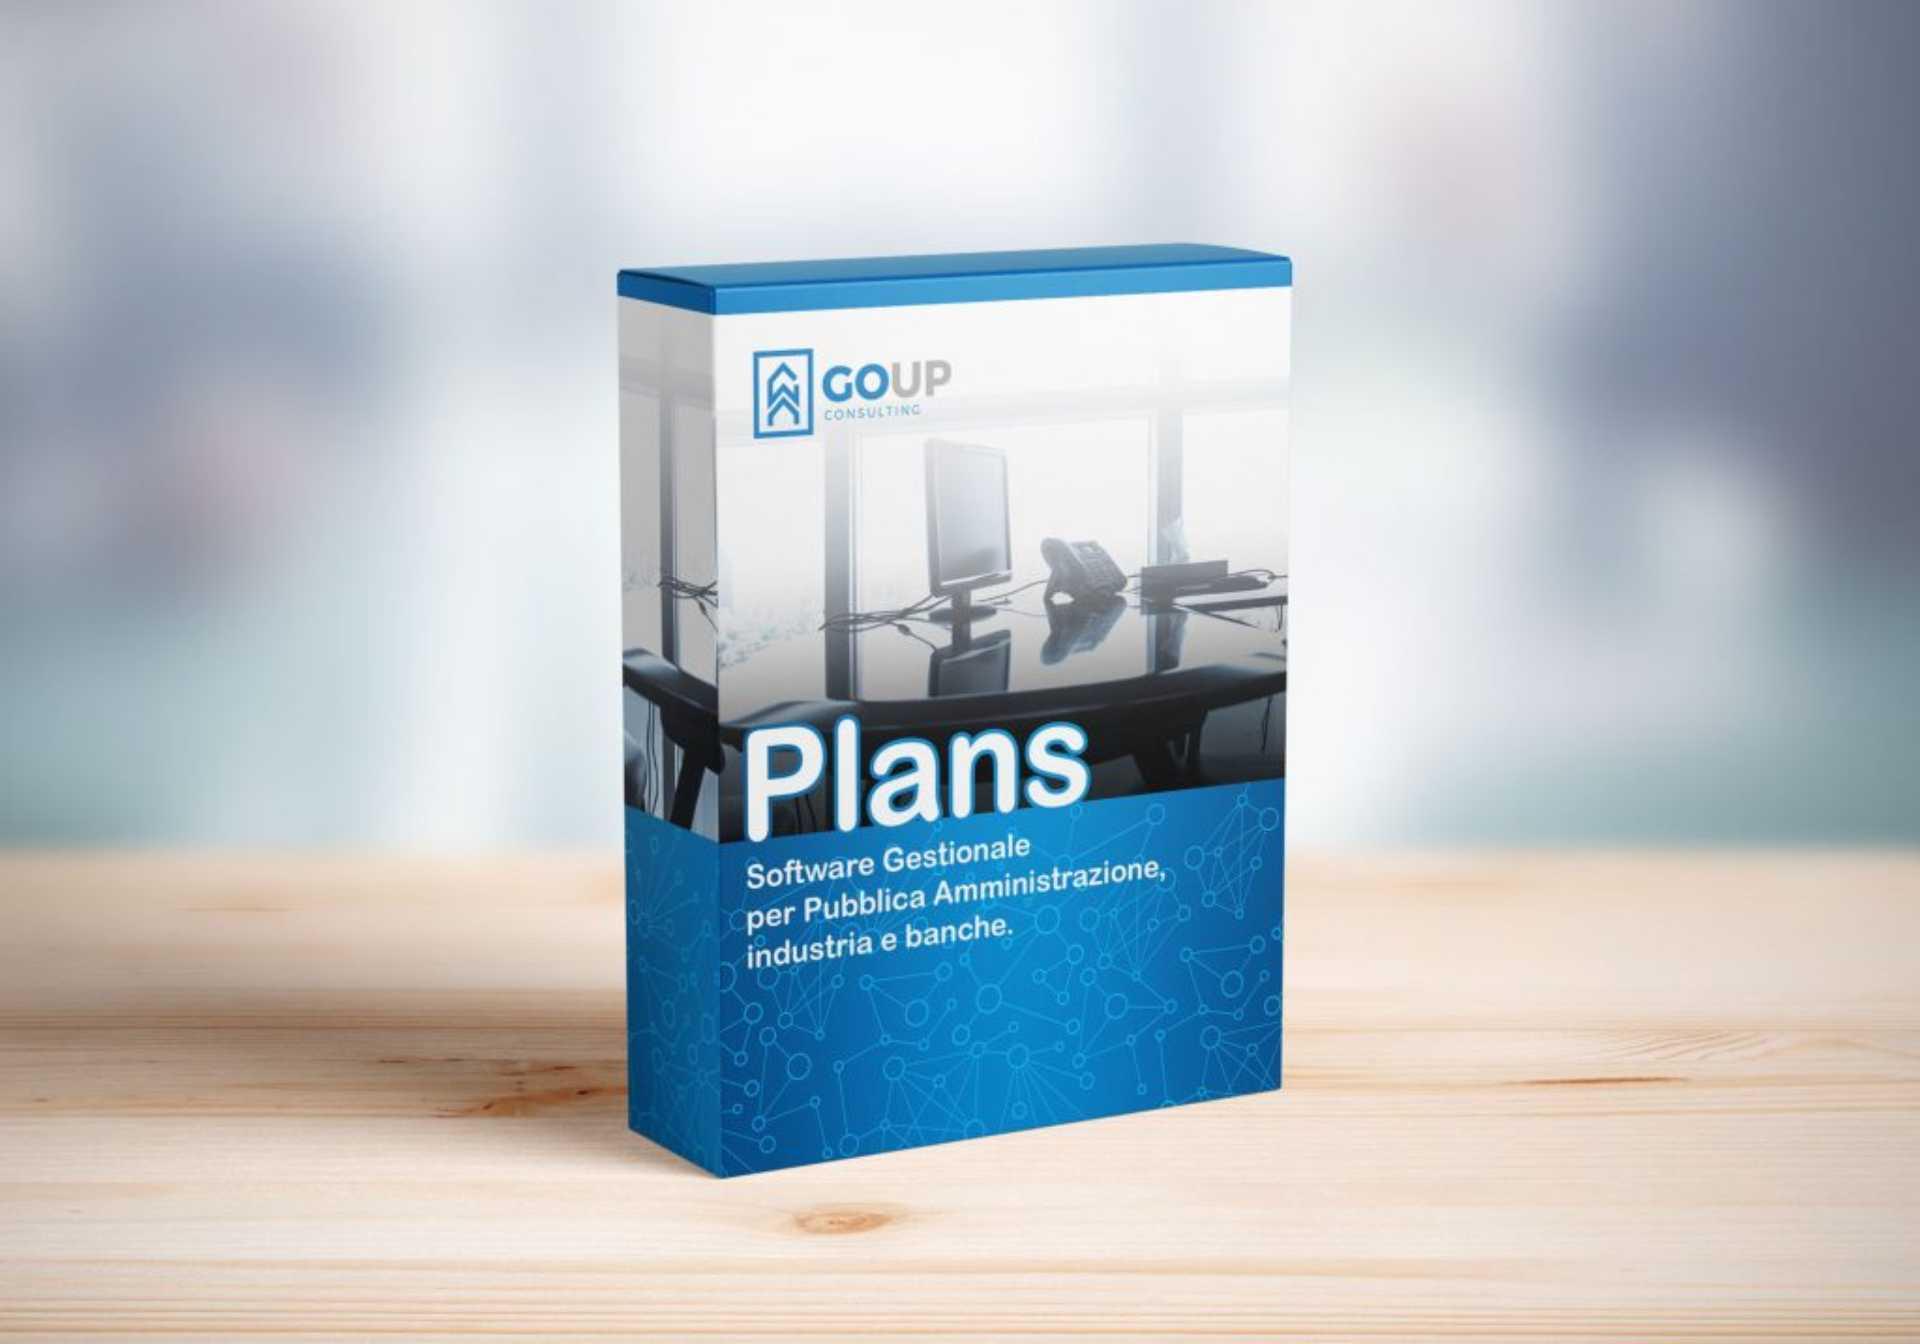 plans software gestionale